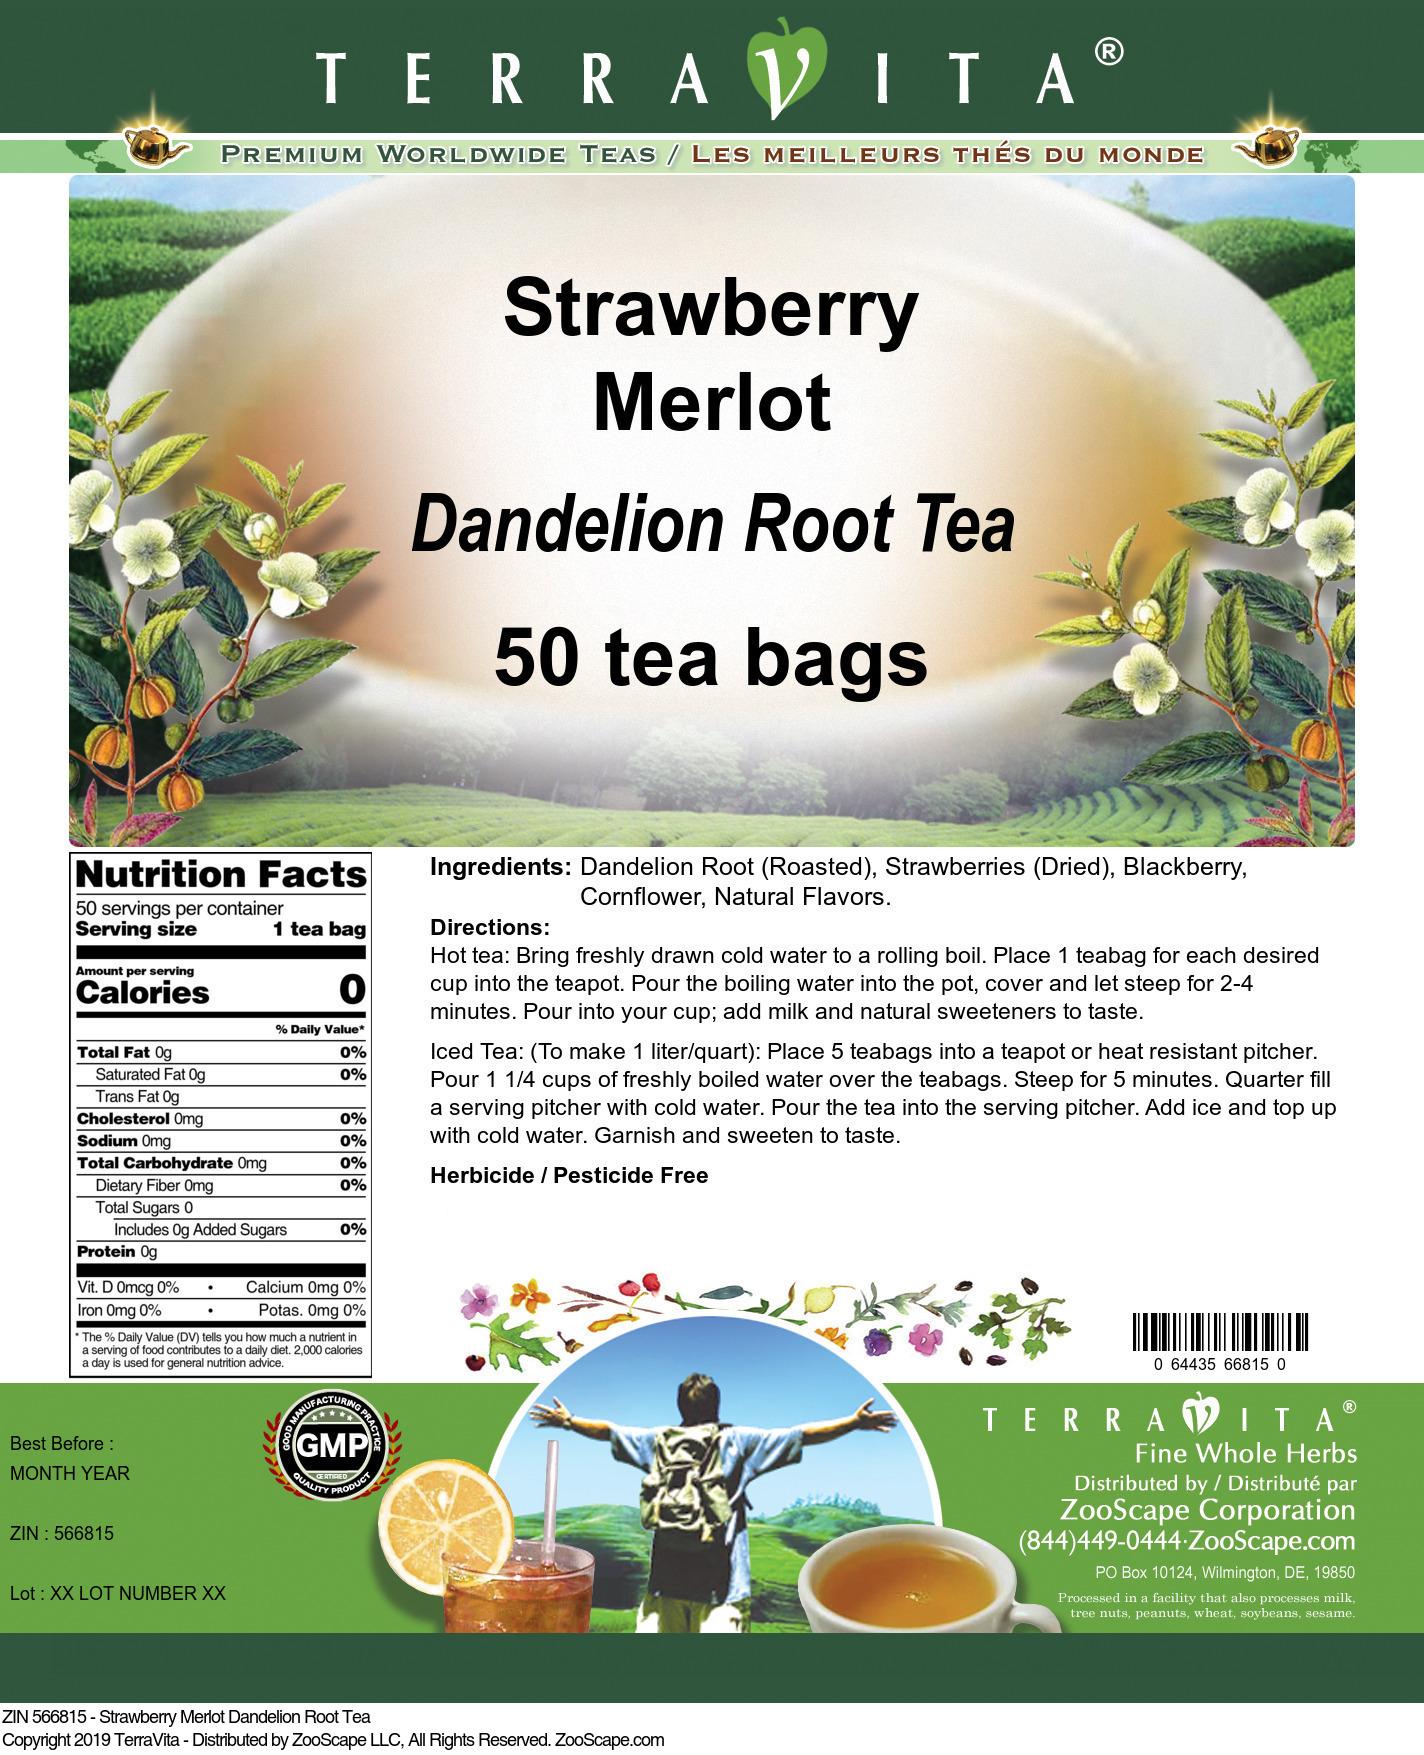 Strawberry Merlot Dandelion Root Tea